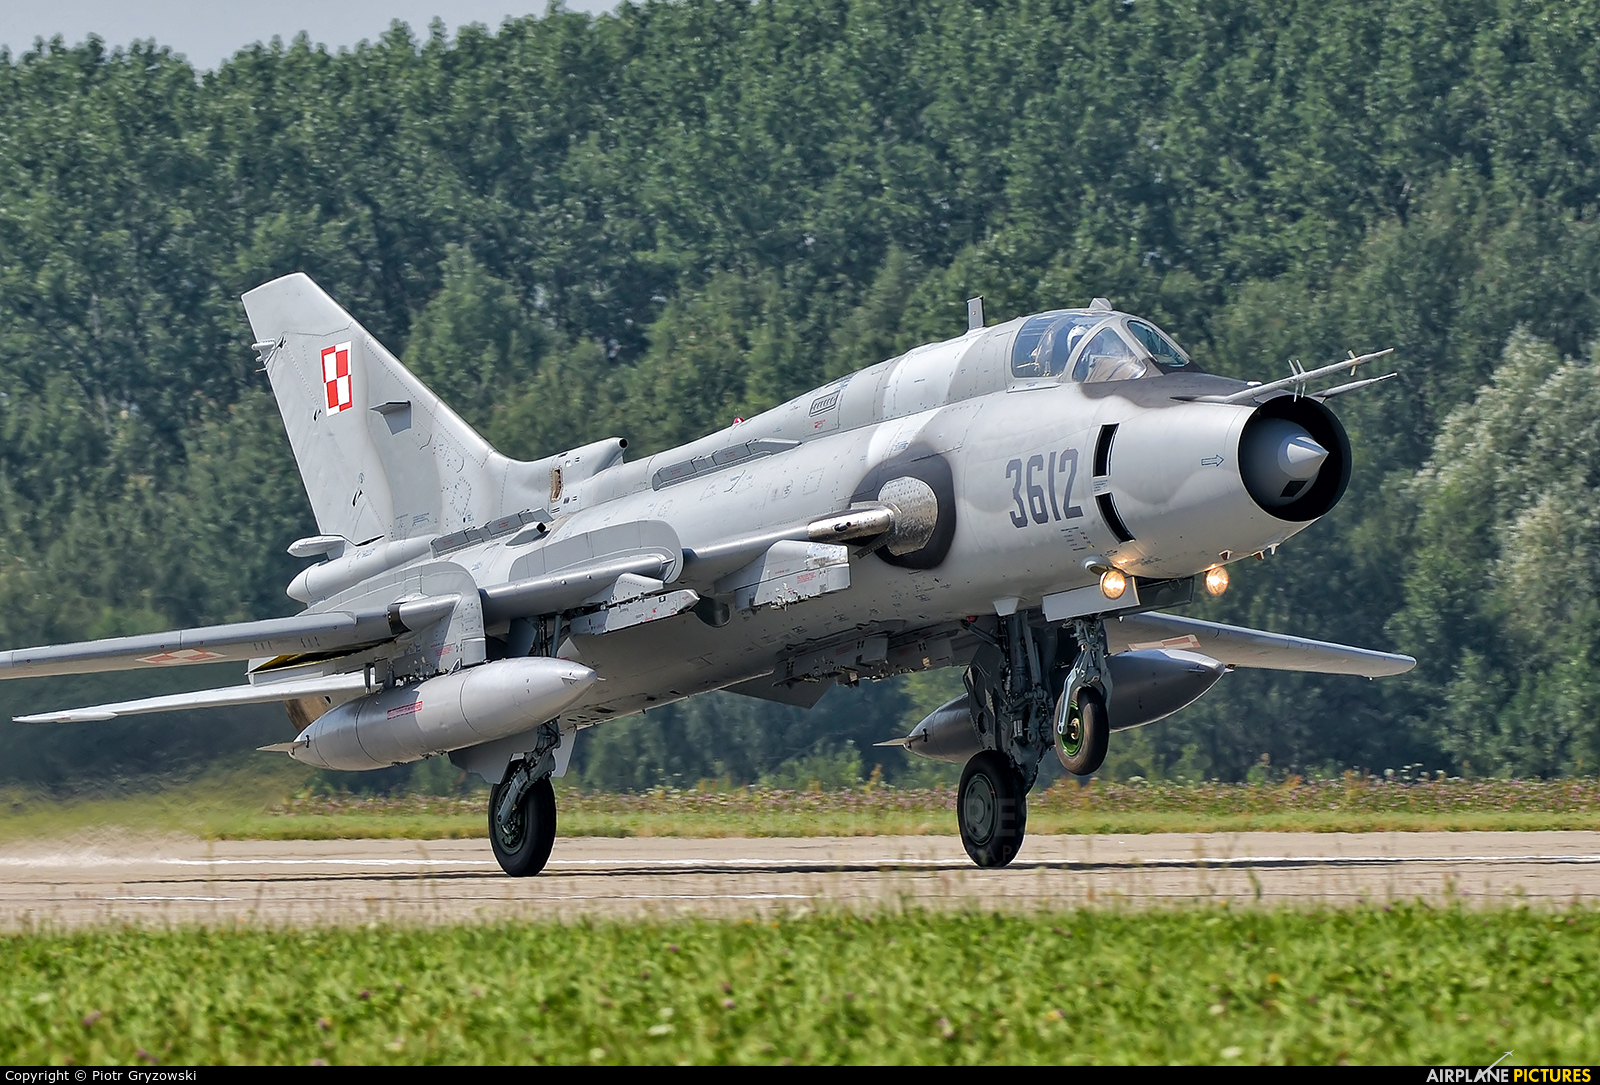 Poland - Air Force 3612 aircraft at Mińsk Mazowiecki